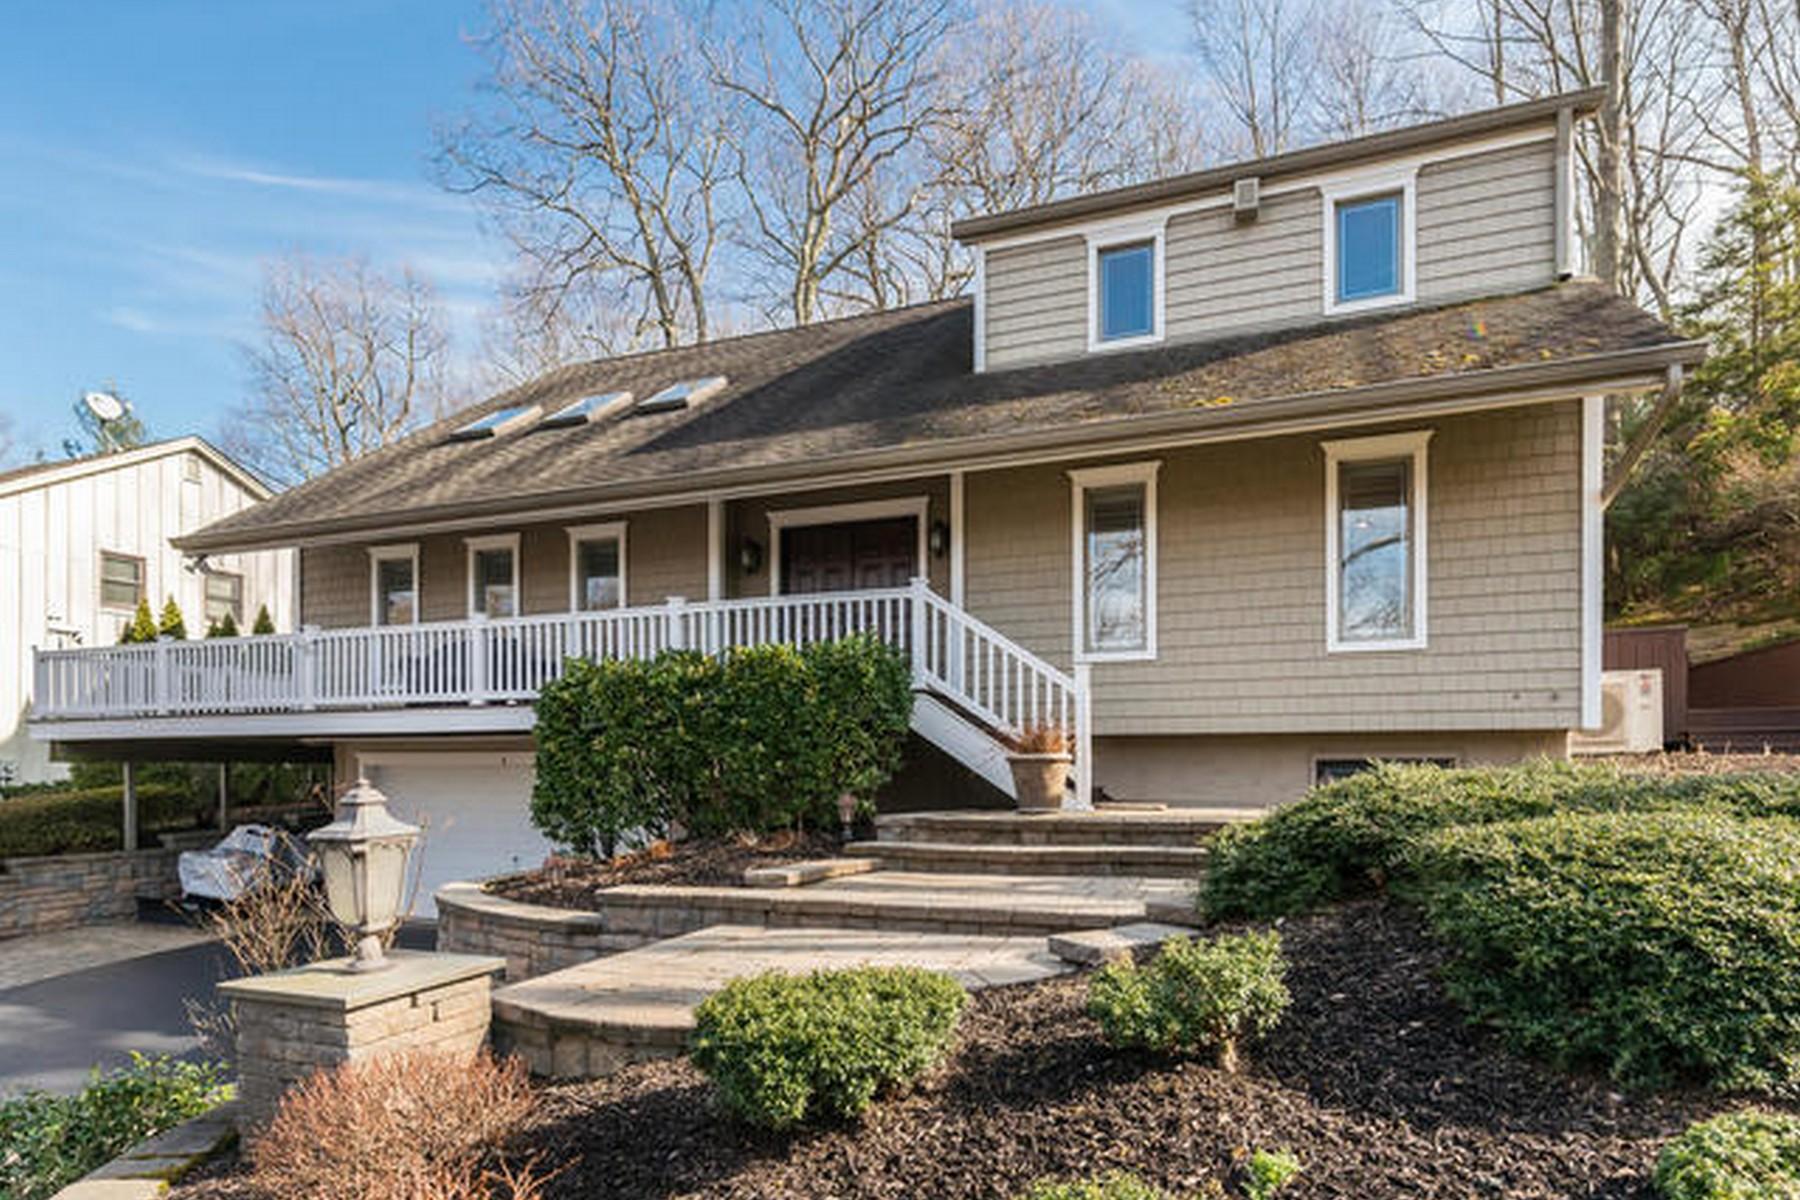 Single Family Homes for Sale at Huntington 4 East Neck Huntington, New York 11743 United States